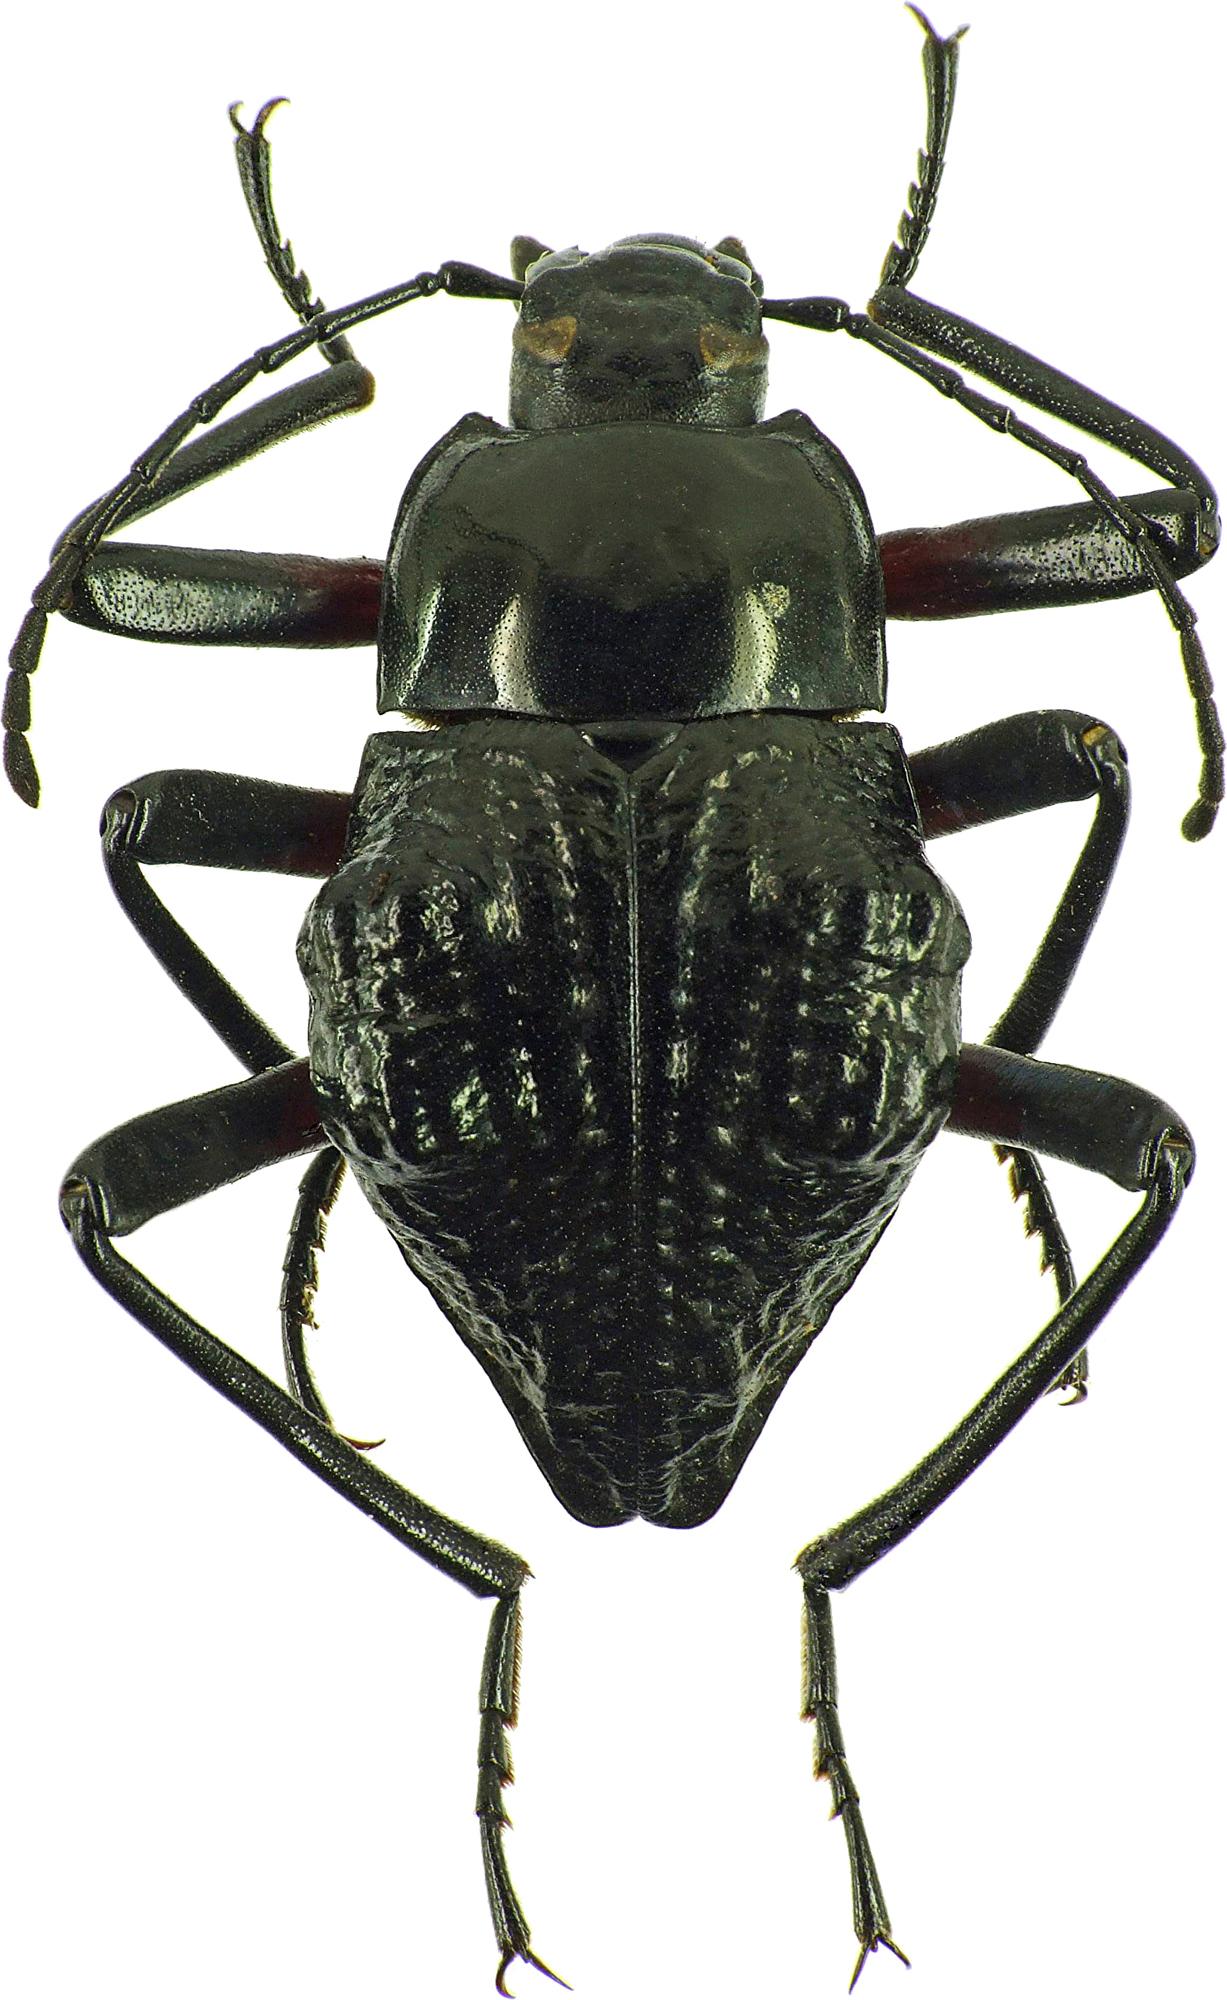 Eulytus nodipennis 25634cz41.jpg